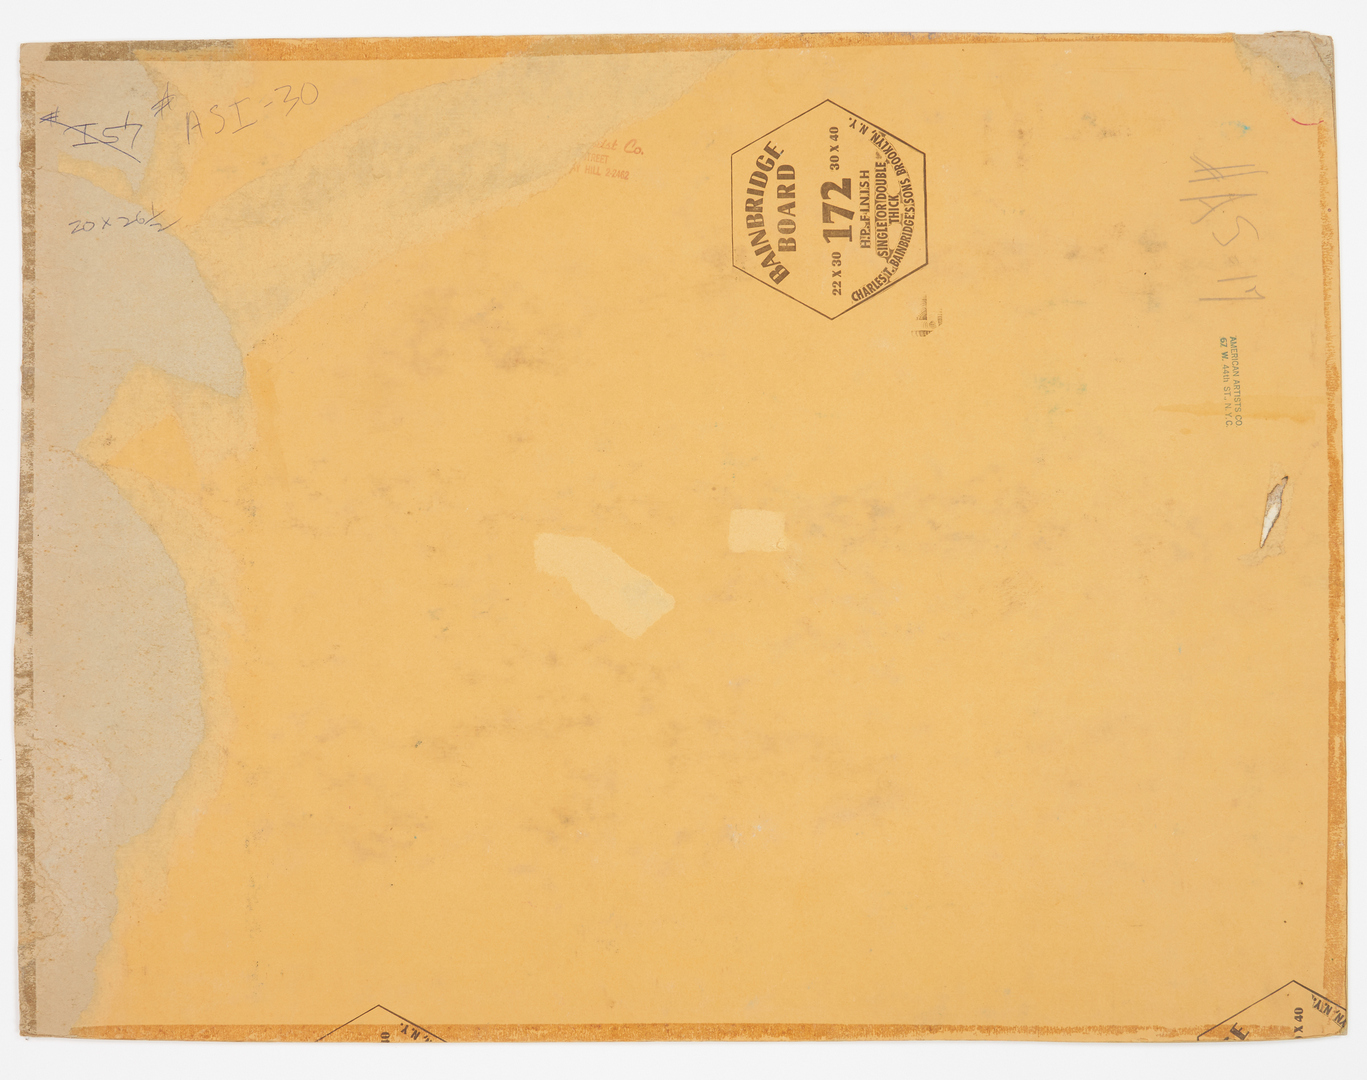 Lot 536: 3 Book or Magazine Illustrations incl. Sarnoff, Grefe